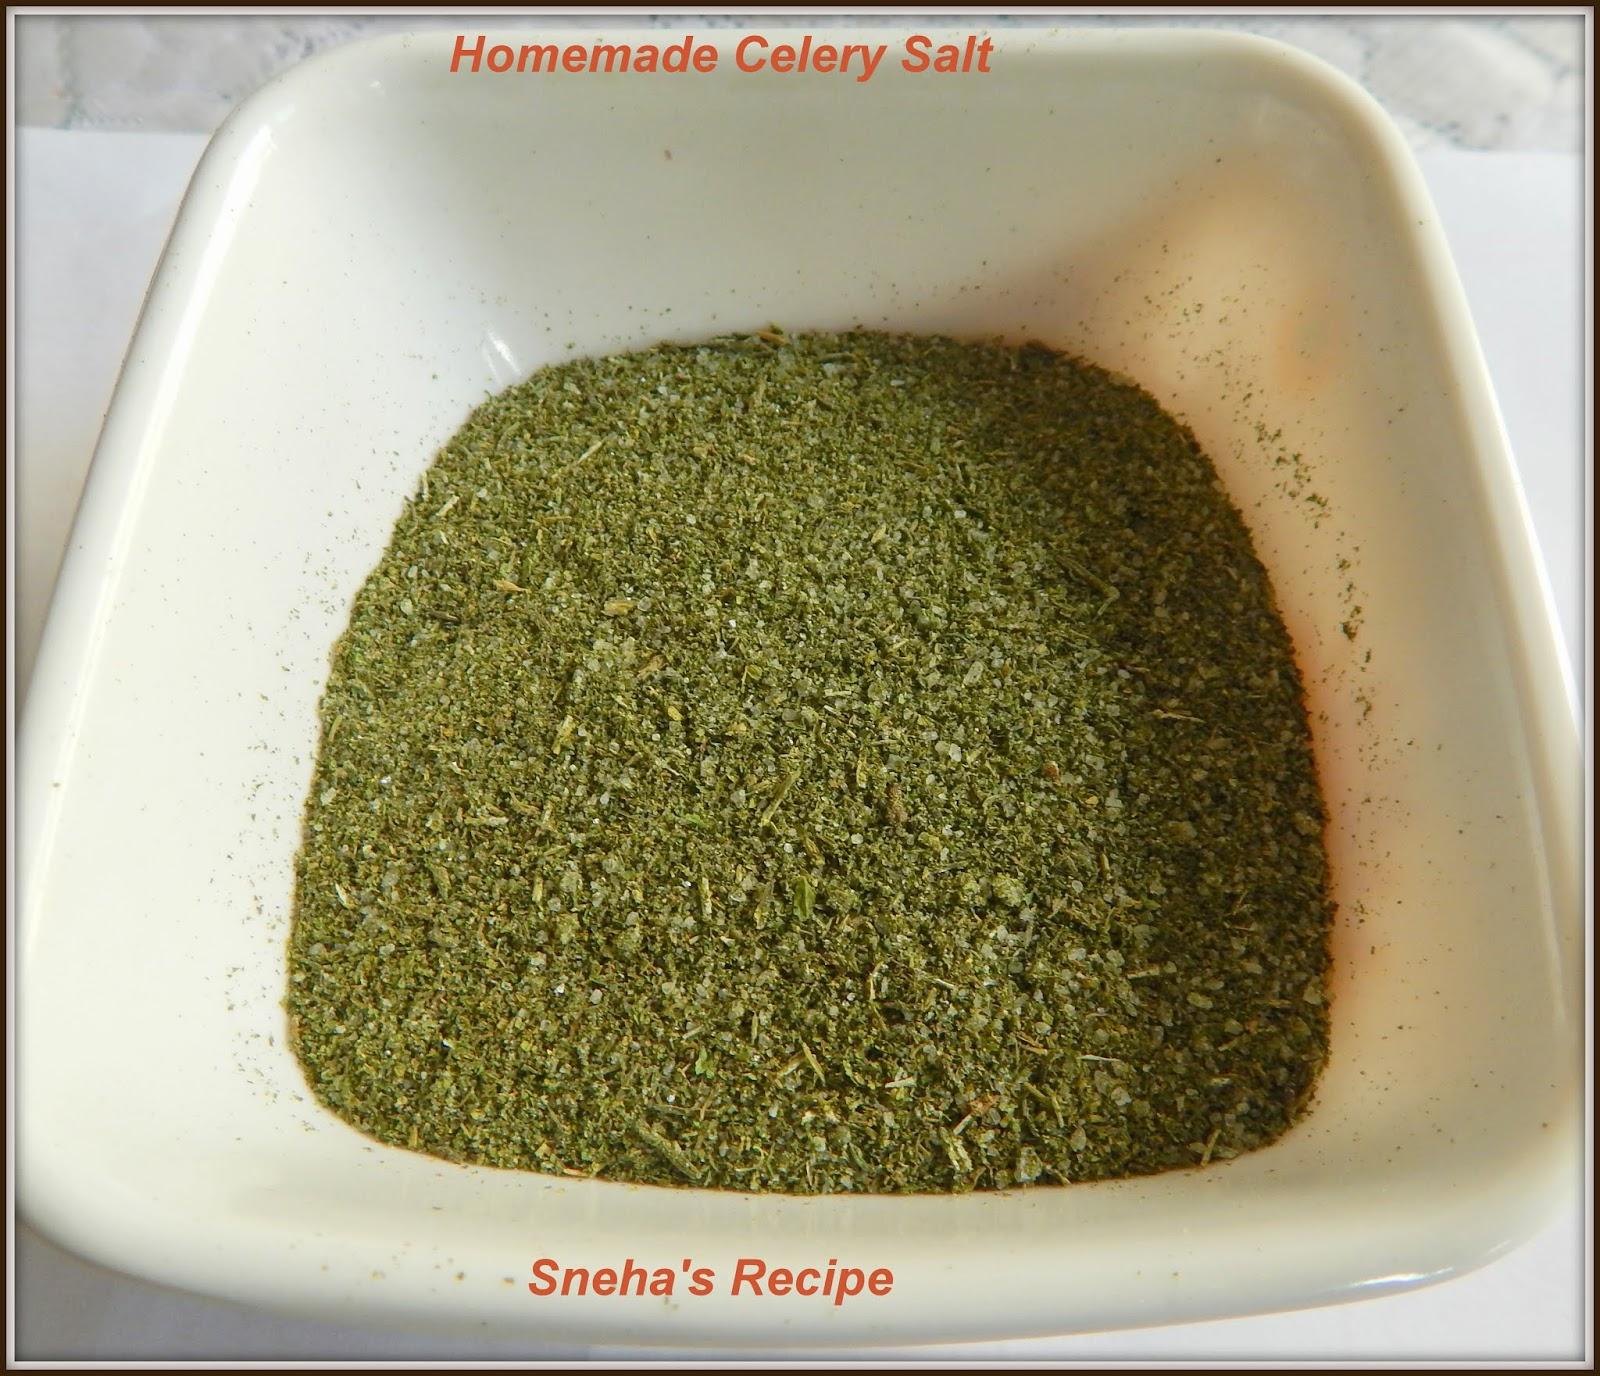 Homemade Celery Salt Foodieextravaganza Sneha S Recipe